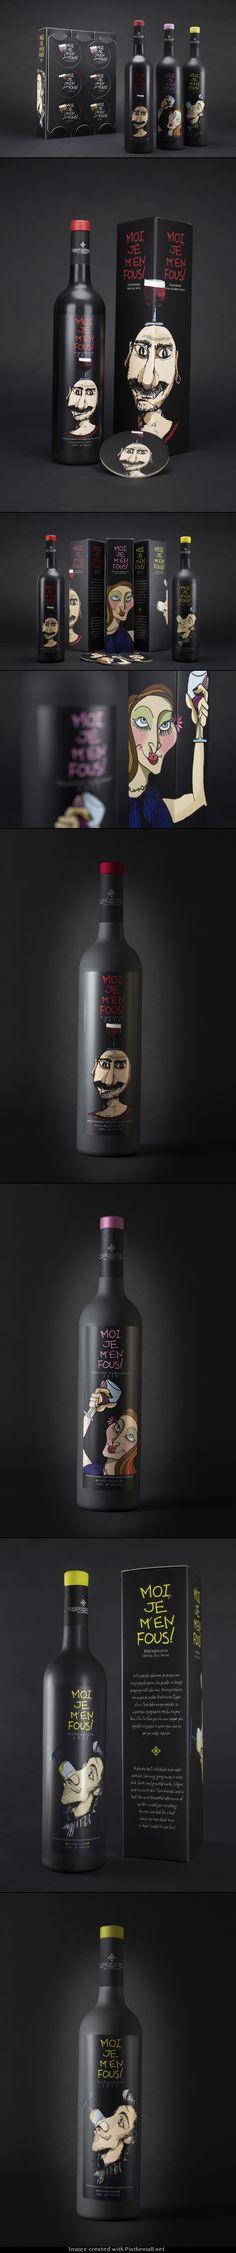 MOI JE M 'EN FOUS! Wine Series for DOMAINE MESSENICOLAS  #taninotanino #vinosmaximum